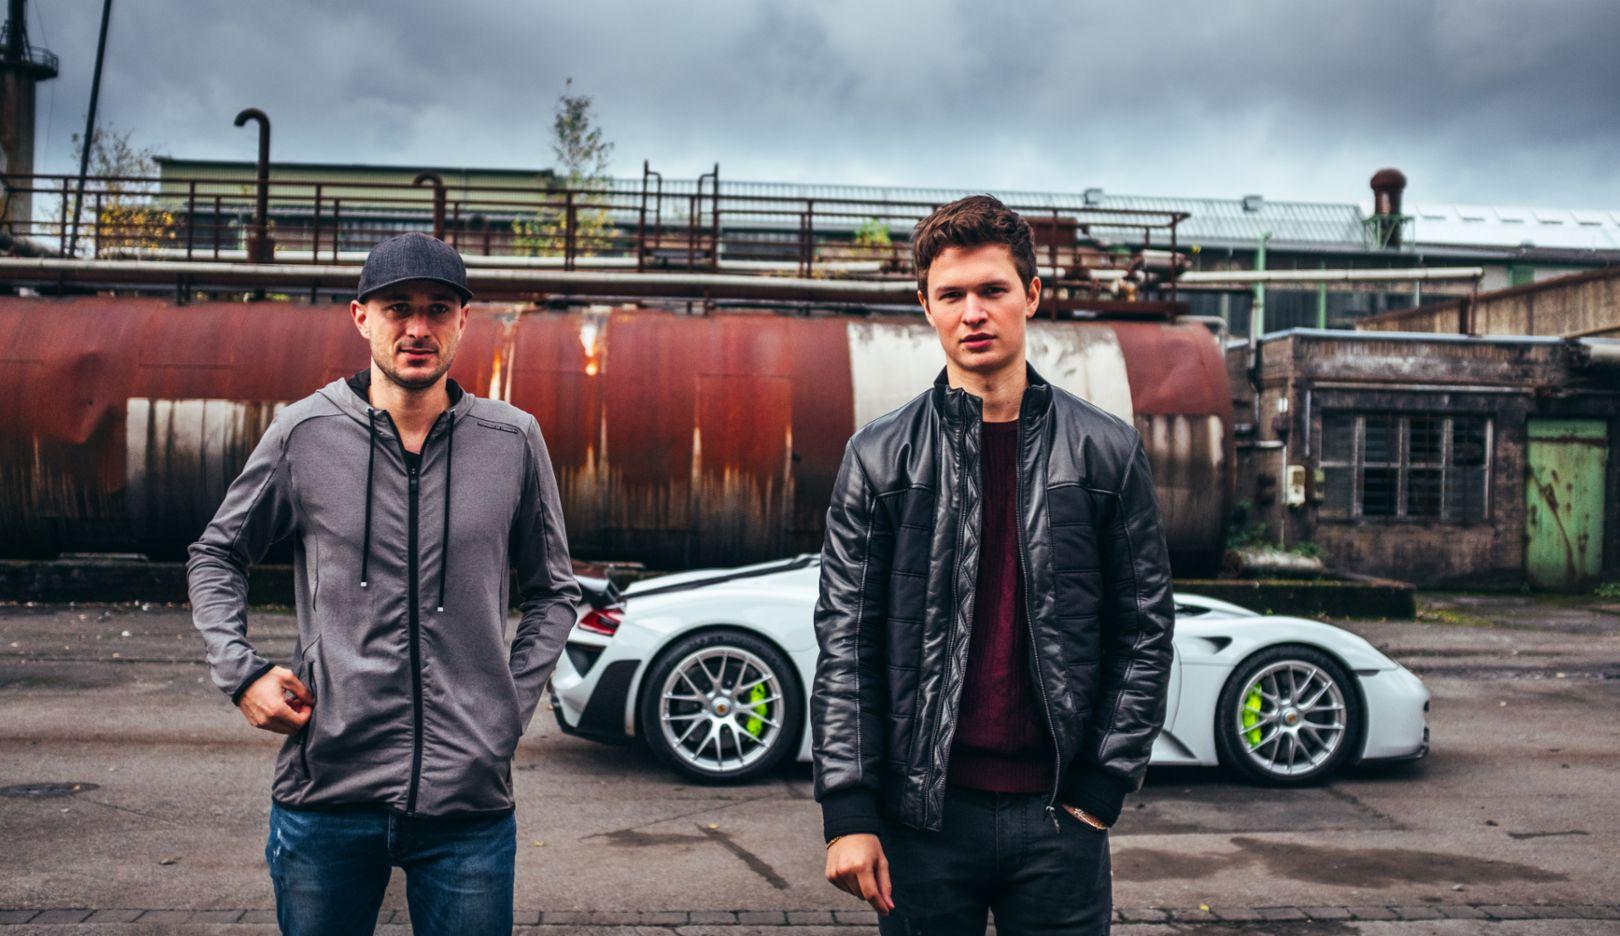 Lars Kern, Porsche-Testfahrer, Ansel Elgort, Schauspieler, l-r, 918 Spyder, Hattingen, 2018, Porsche AG